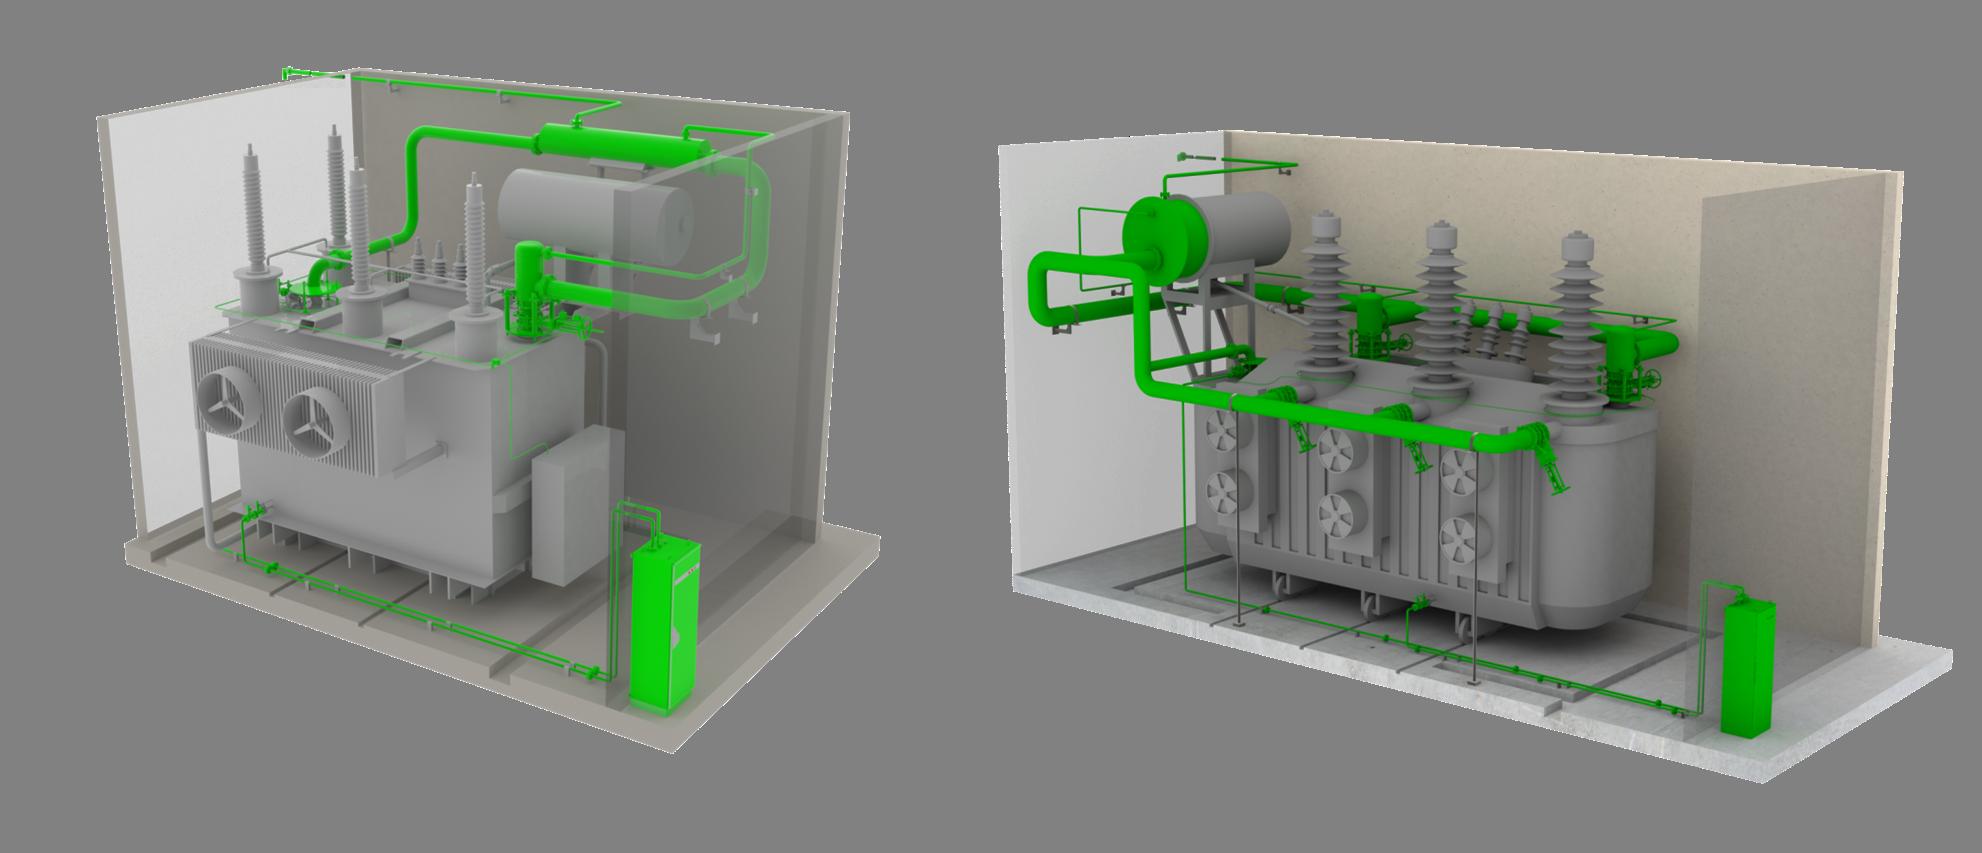 Explosionsschutz Transformator, Brandschutz Transformator, Transformer explosion protection, transformer fire protection, sergi tss_hp_3